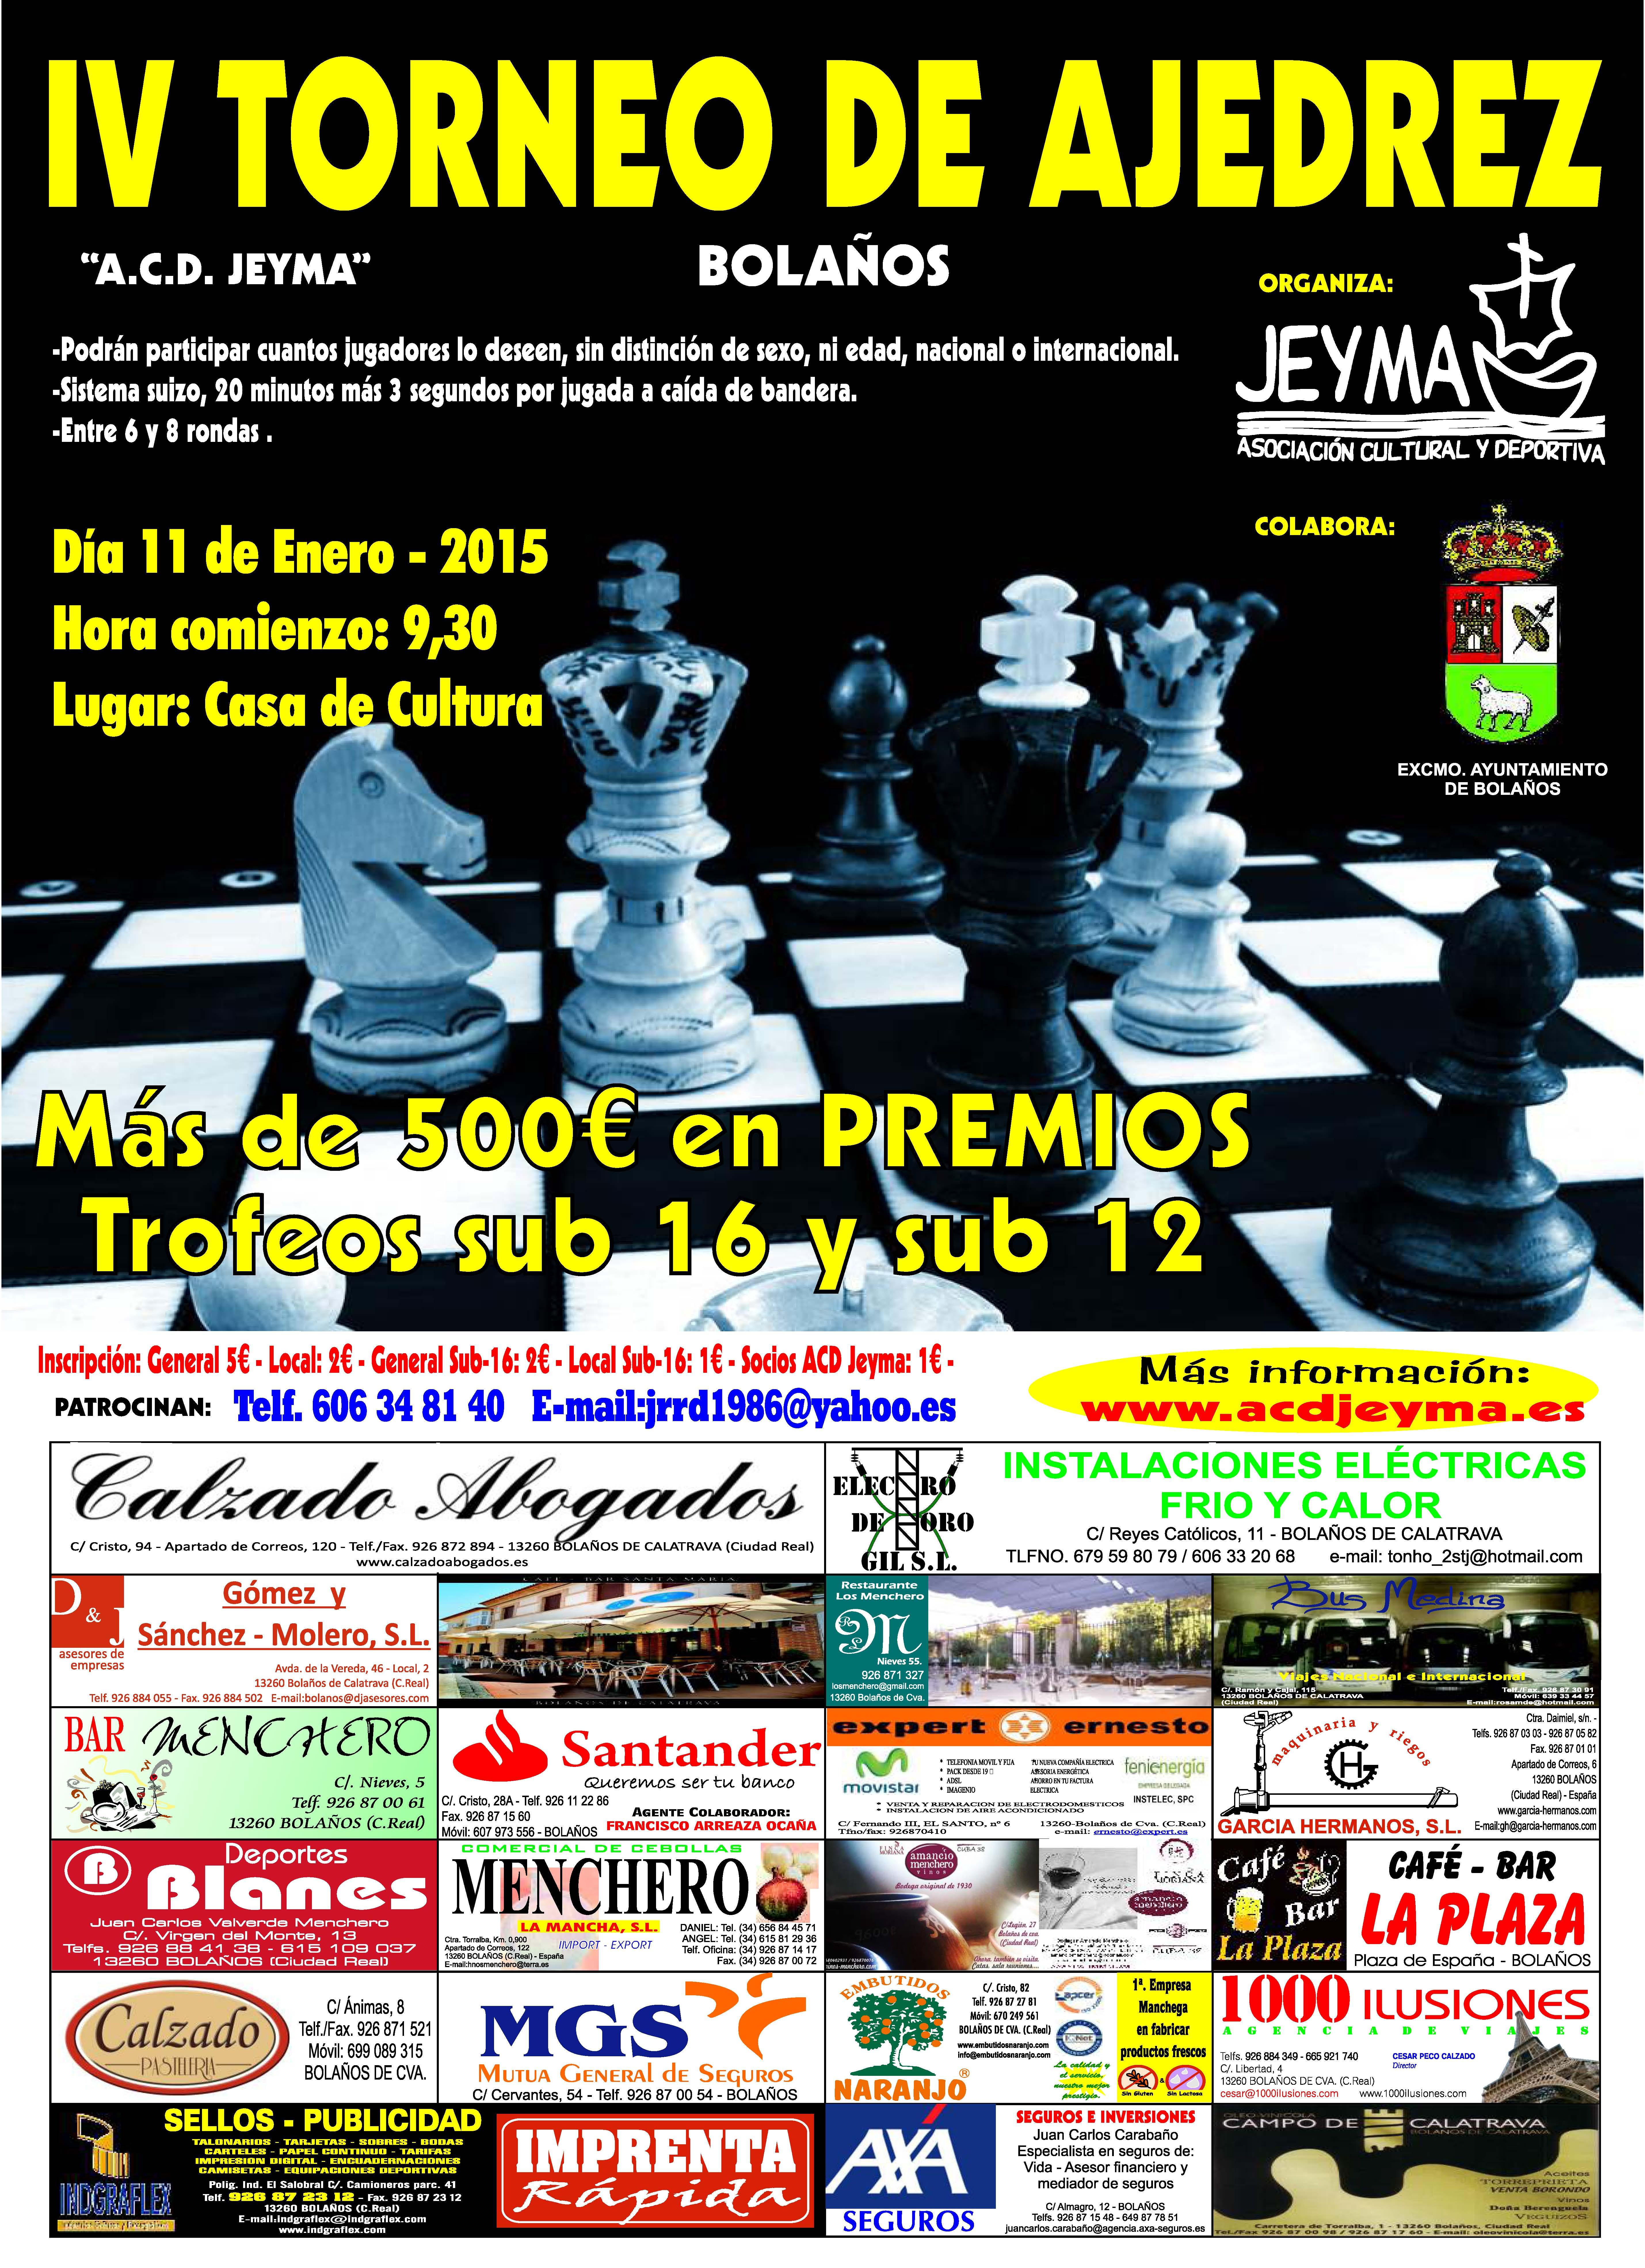 Cartel IV Torneo Ajedrez ACD Jeyma